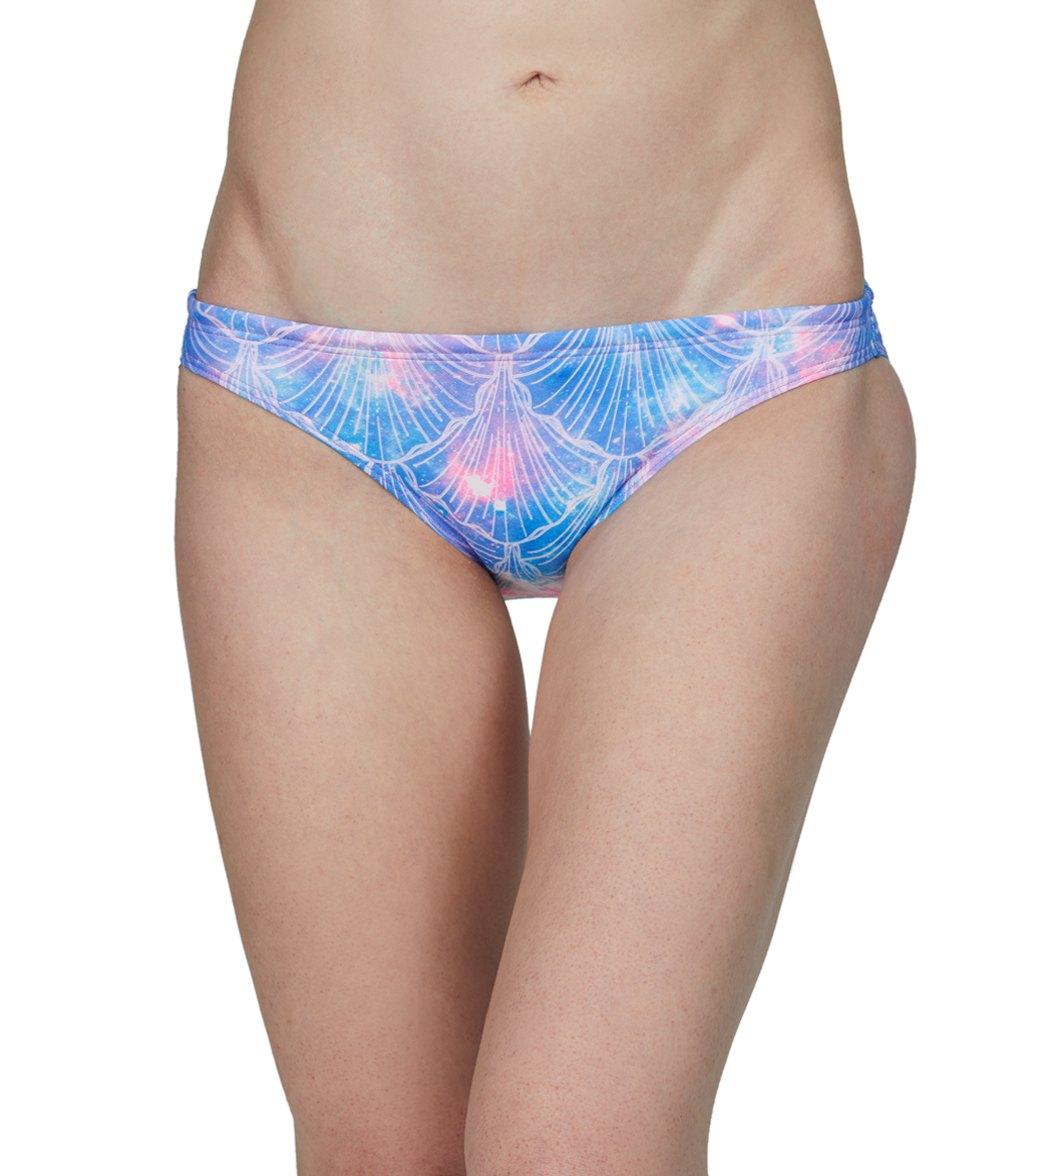 Amanzi Women's Mermaid Kisses Bikini Bottom